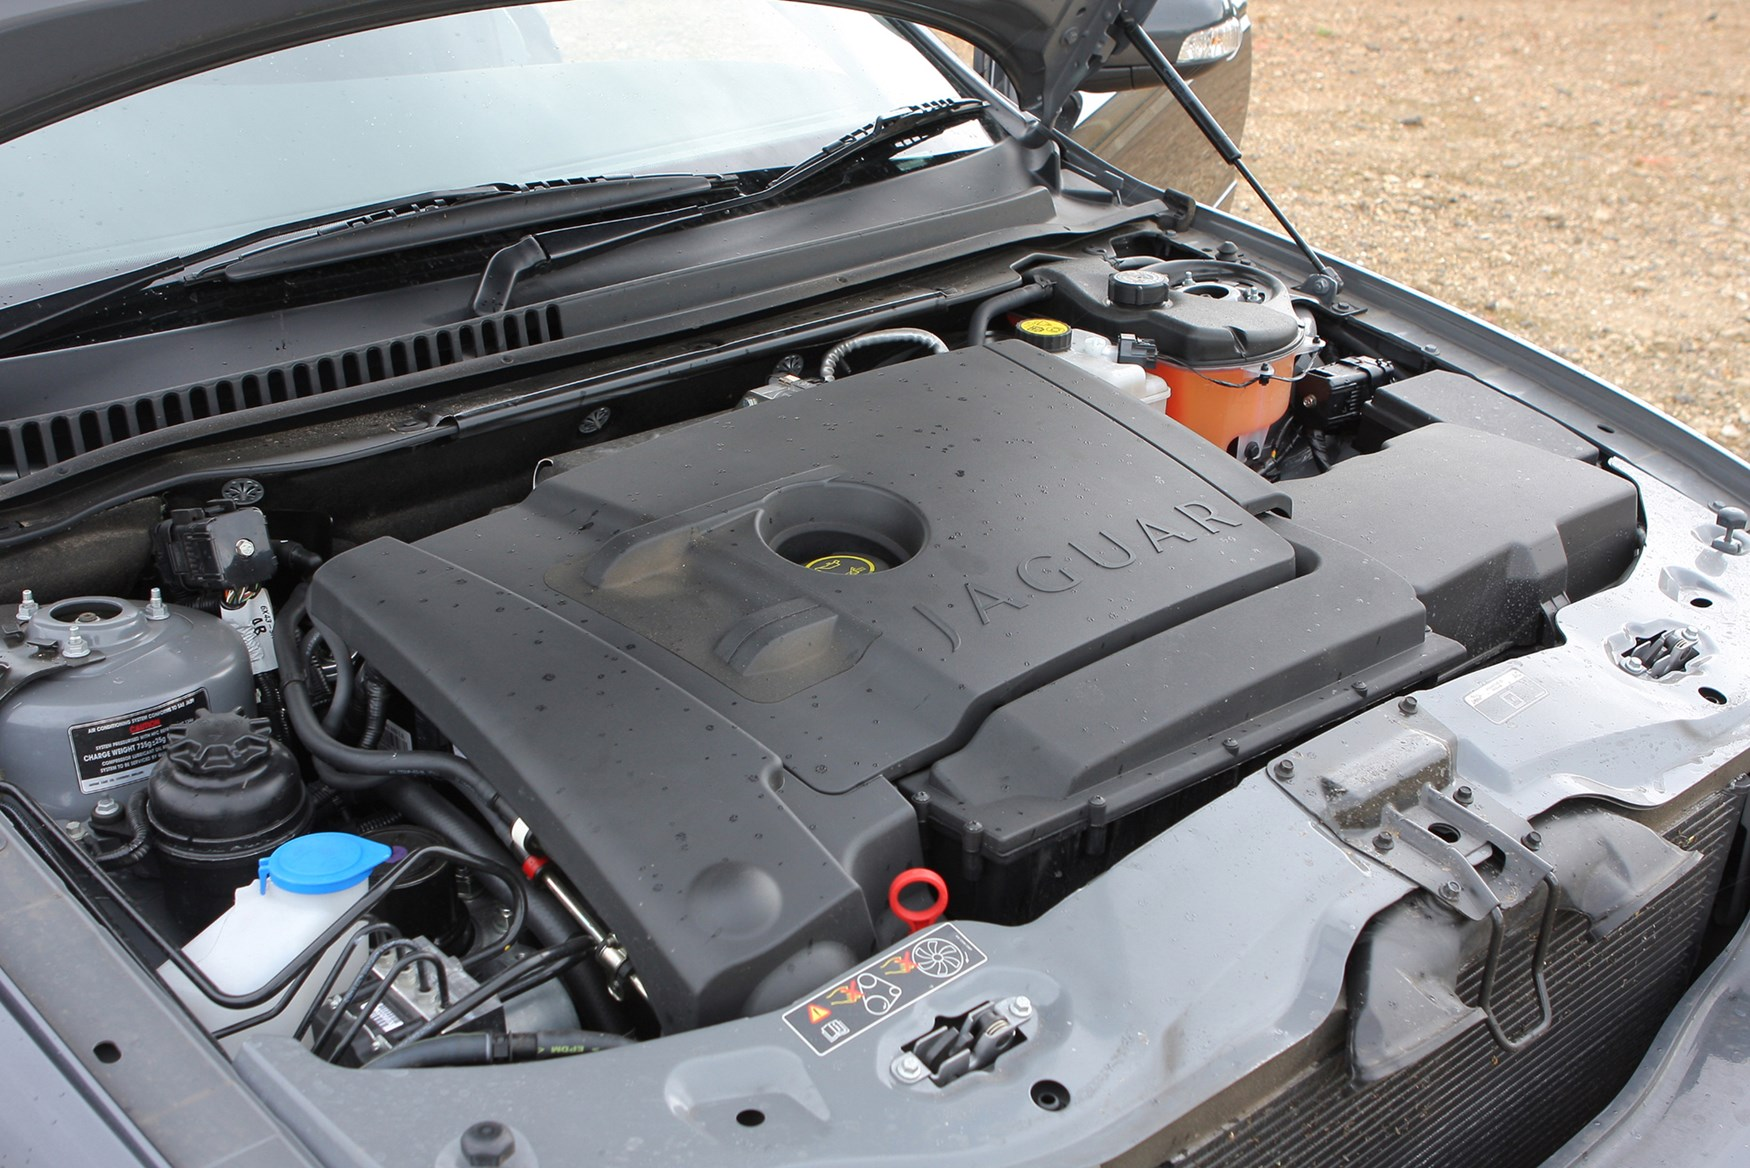 Jaguar E Type V12 Wiring Diagram : Jaguar s type engine failsafe mode free